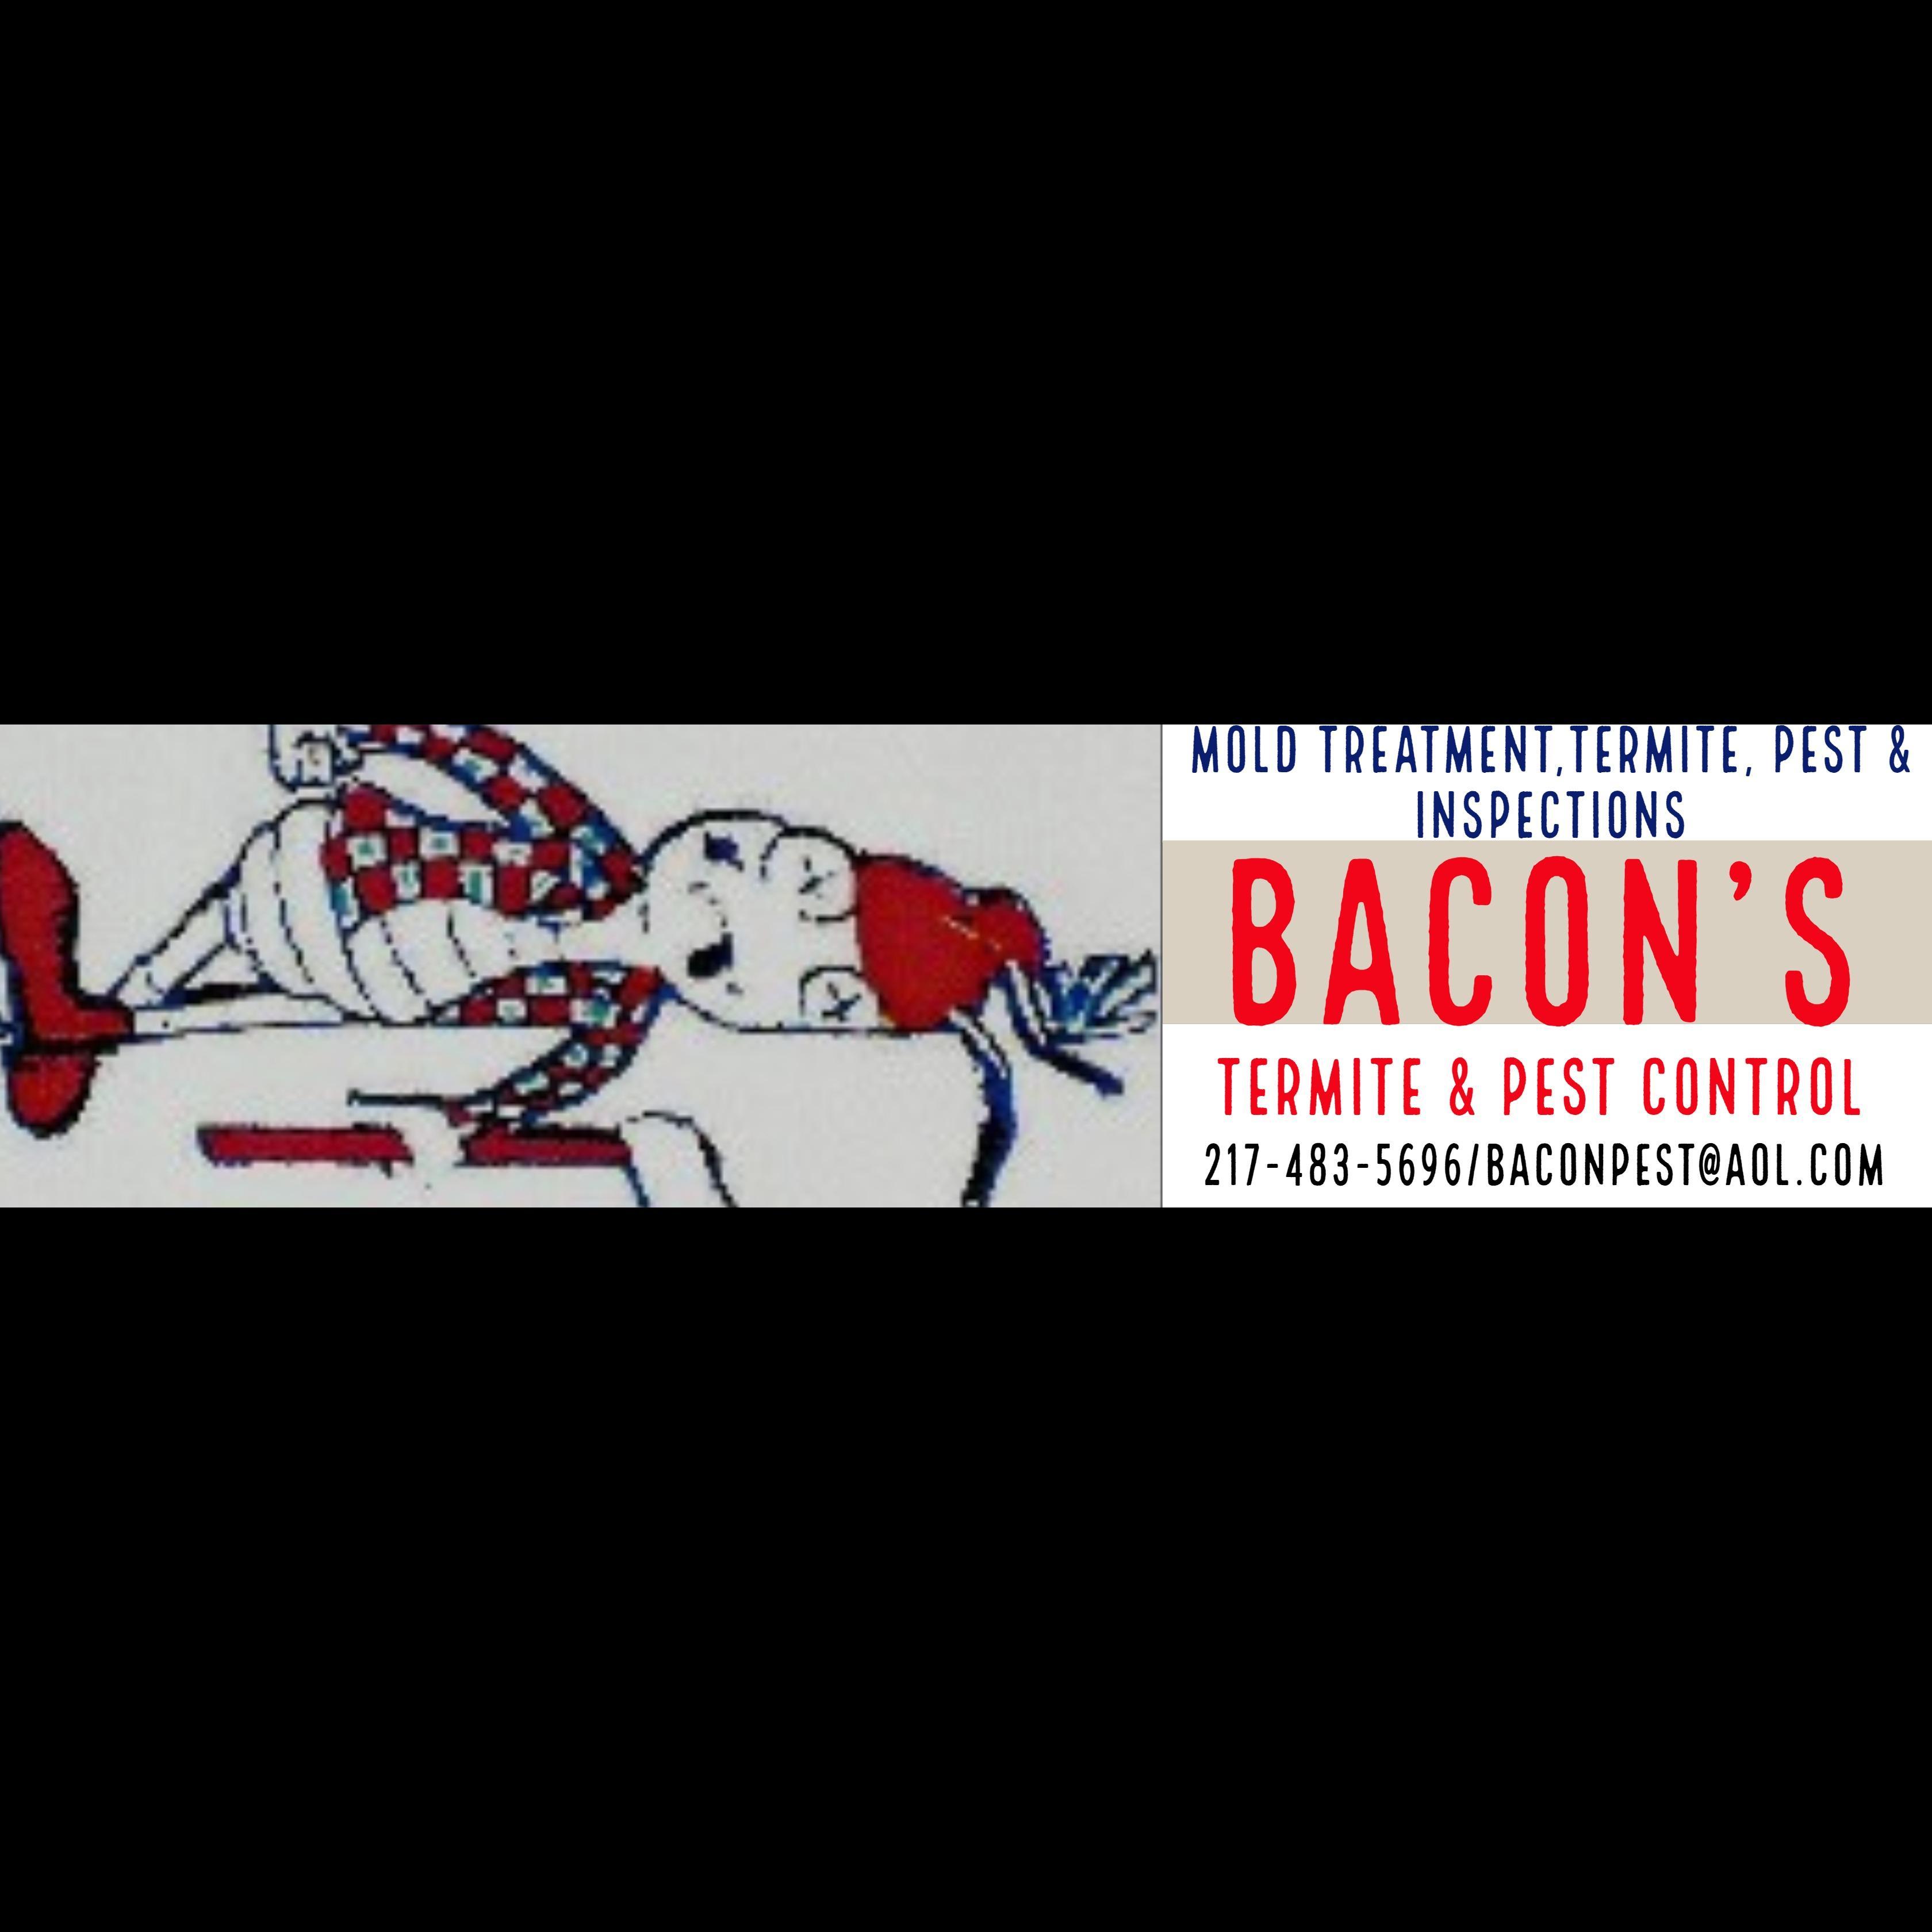 Bacon's Termite & Pest Control, LLC